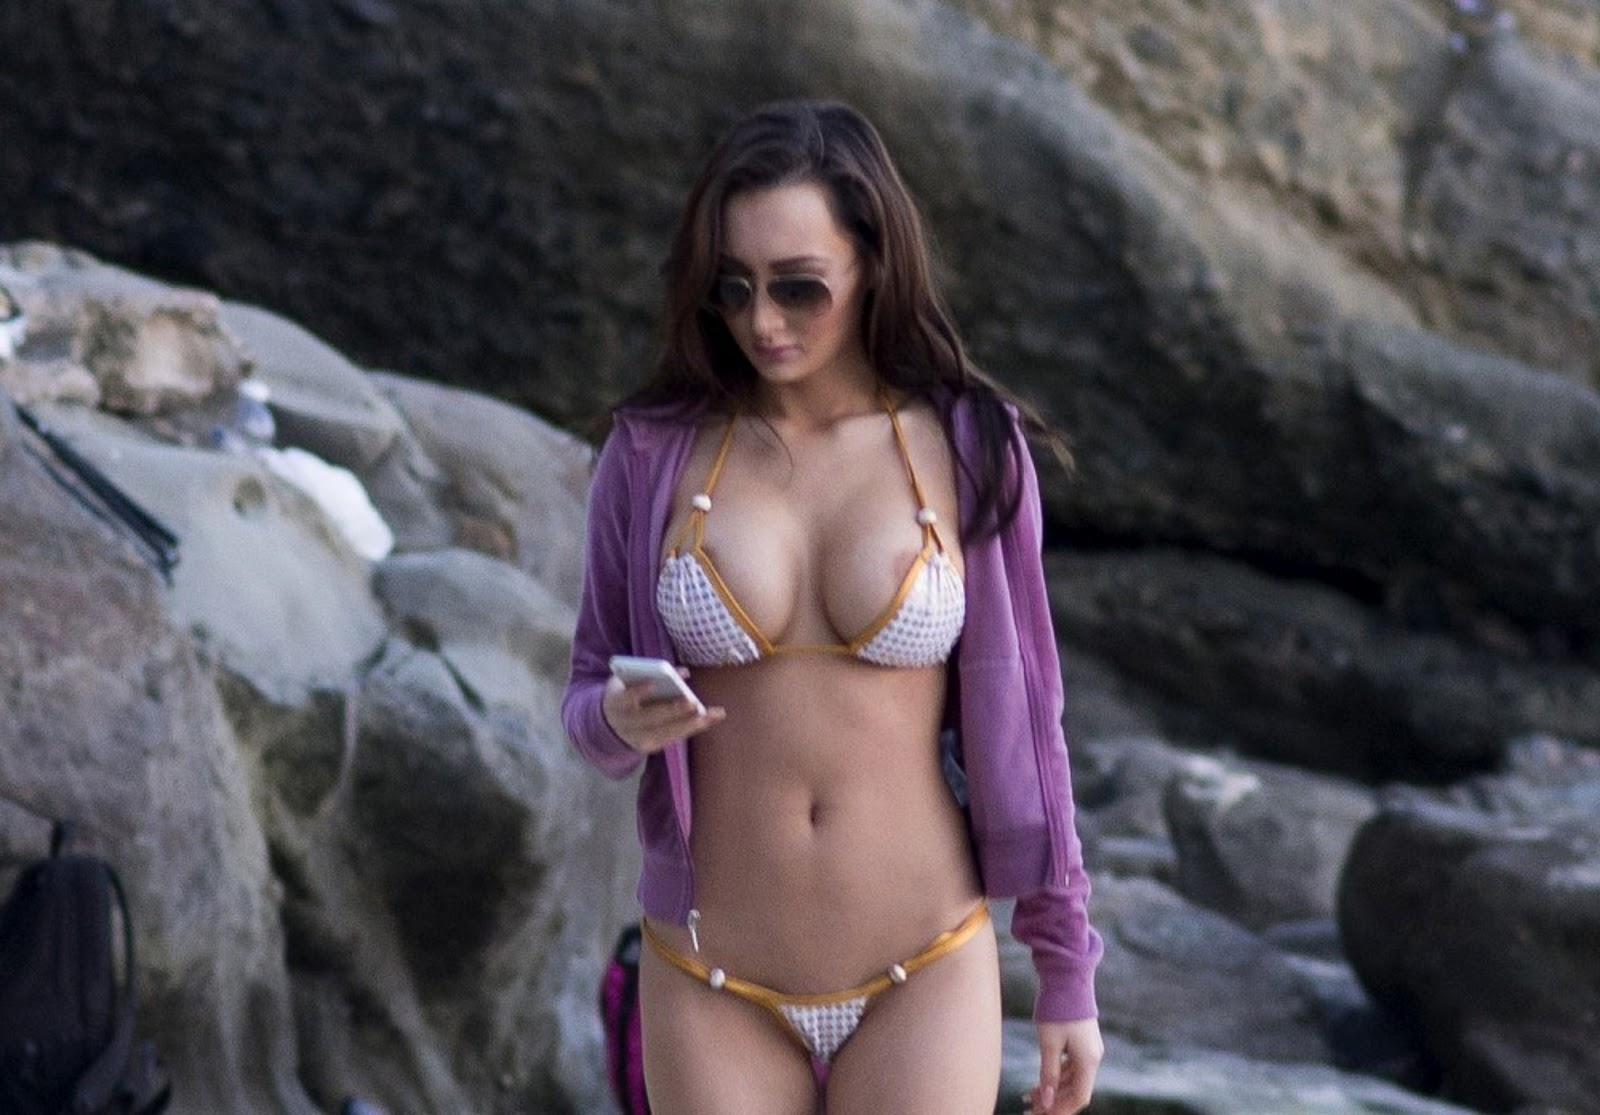 Amy Markham Expose Her Nips